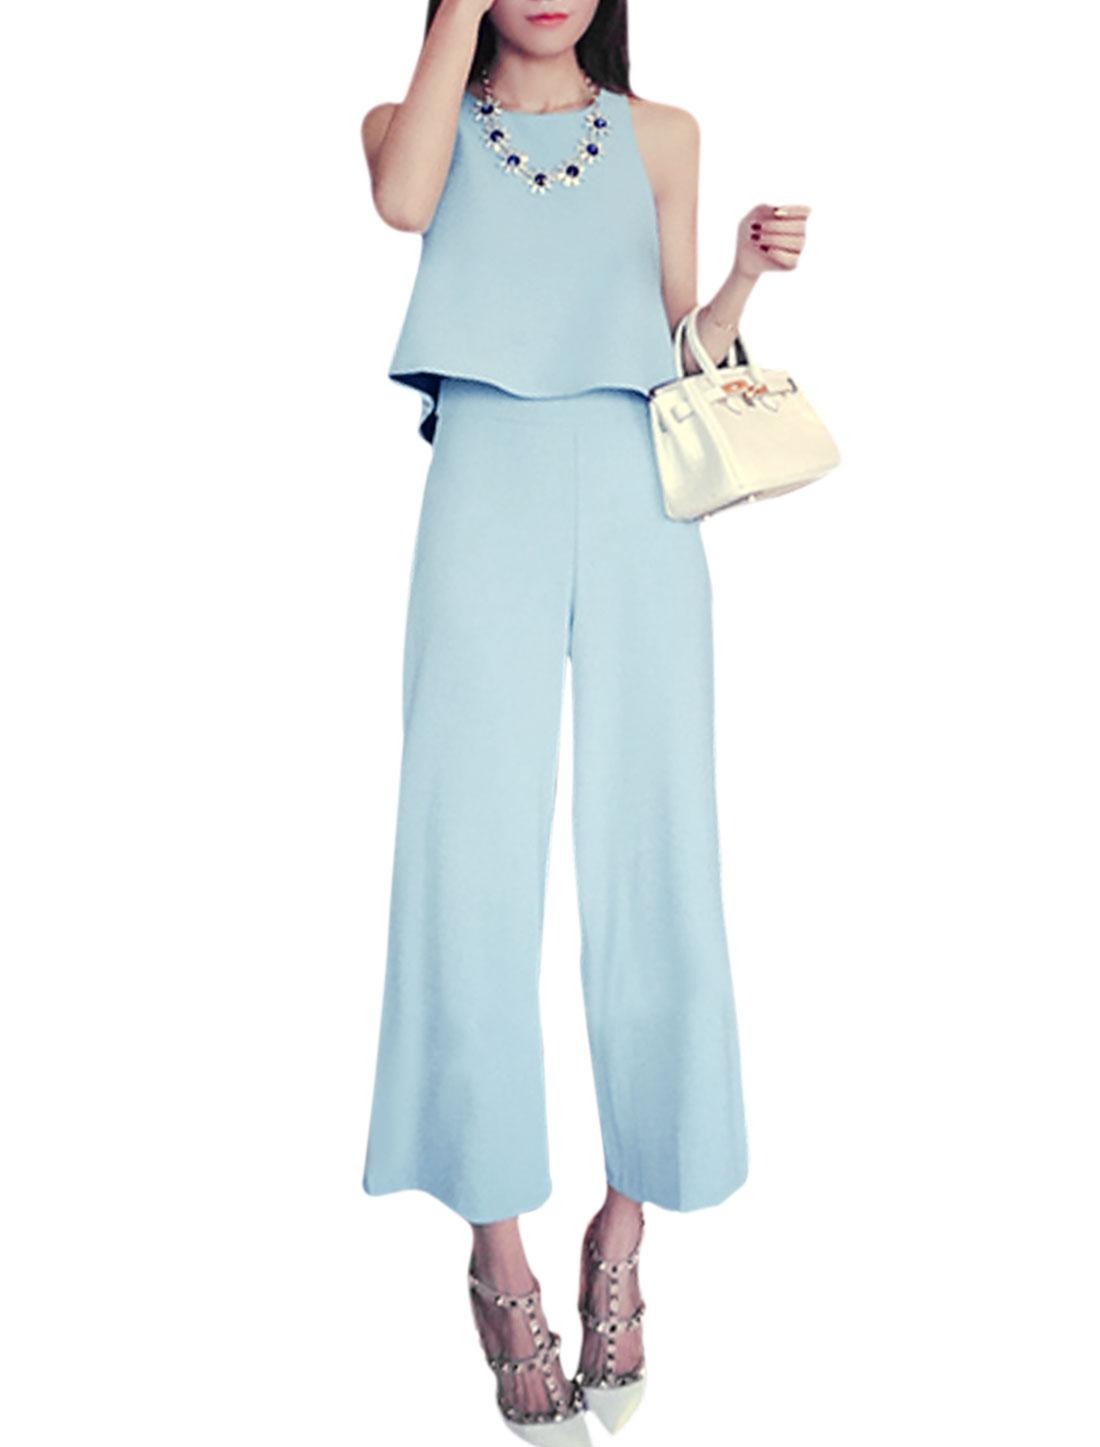 Ladies Loose Top w Zip Fly Wide Leg Casual Cropped Pants Set Sky Blue XS